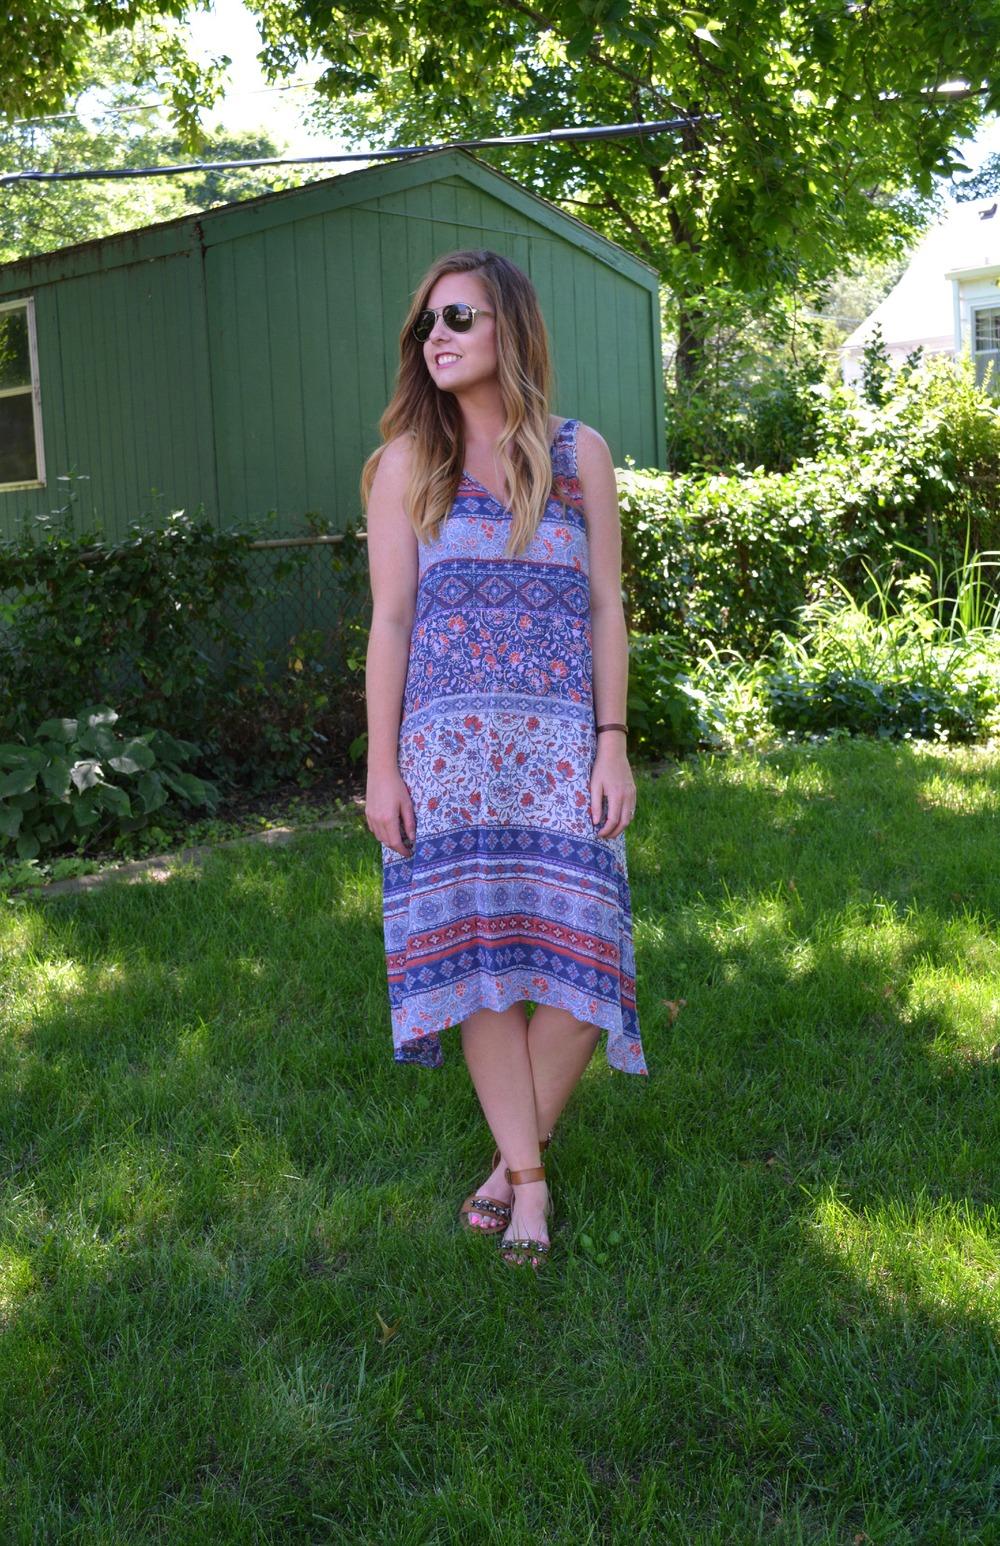 light weight summer dress on sophistiCAITed.com